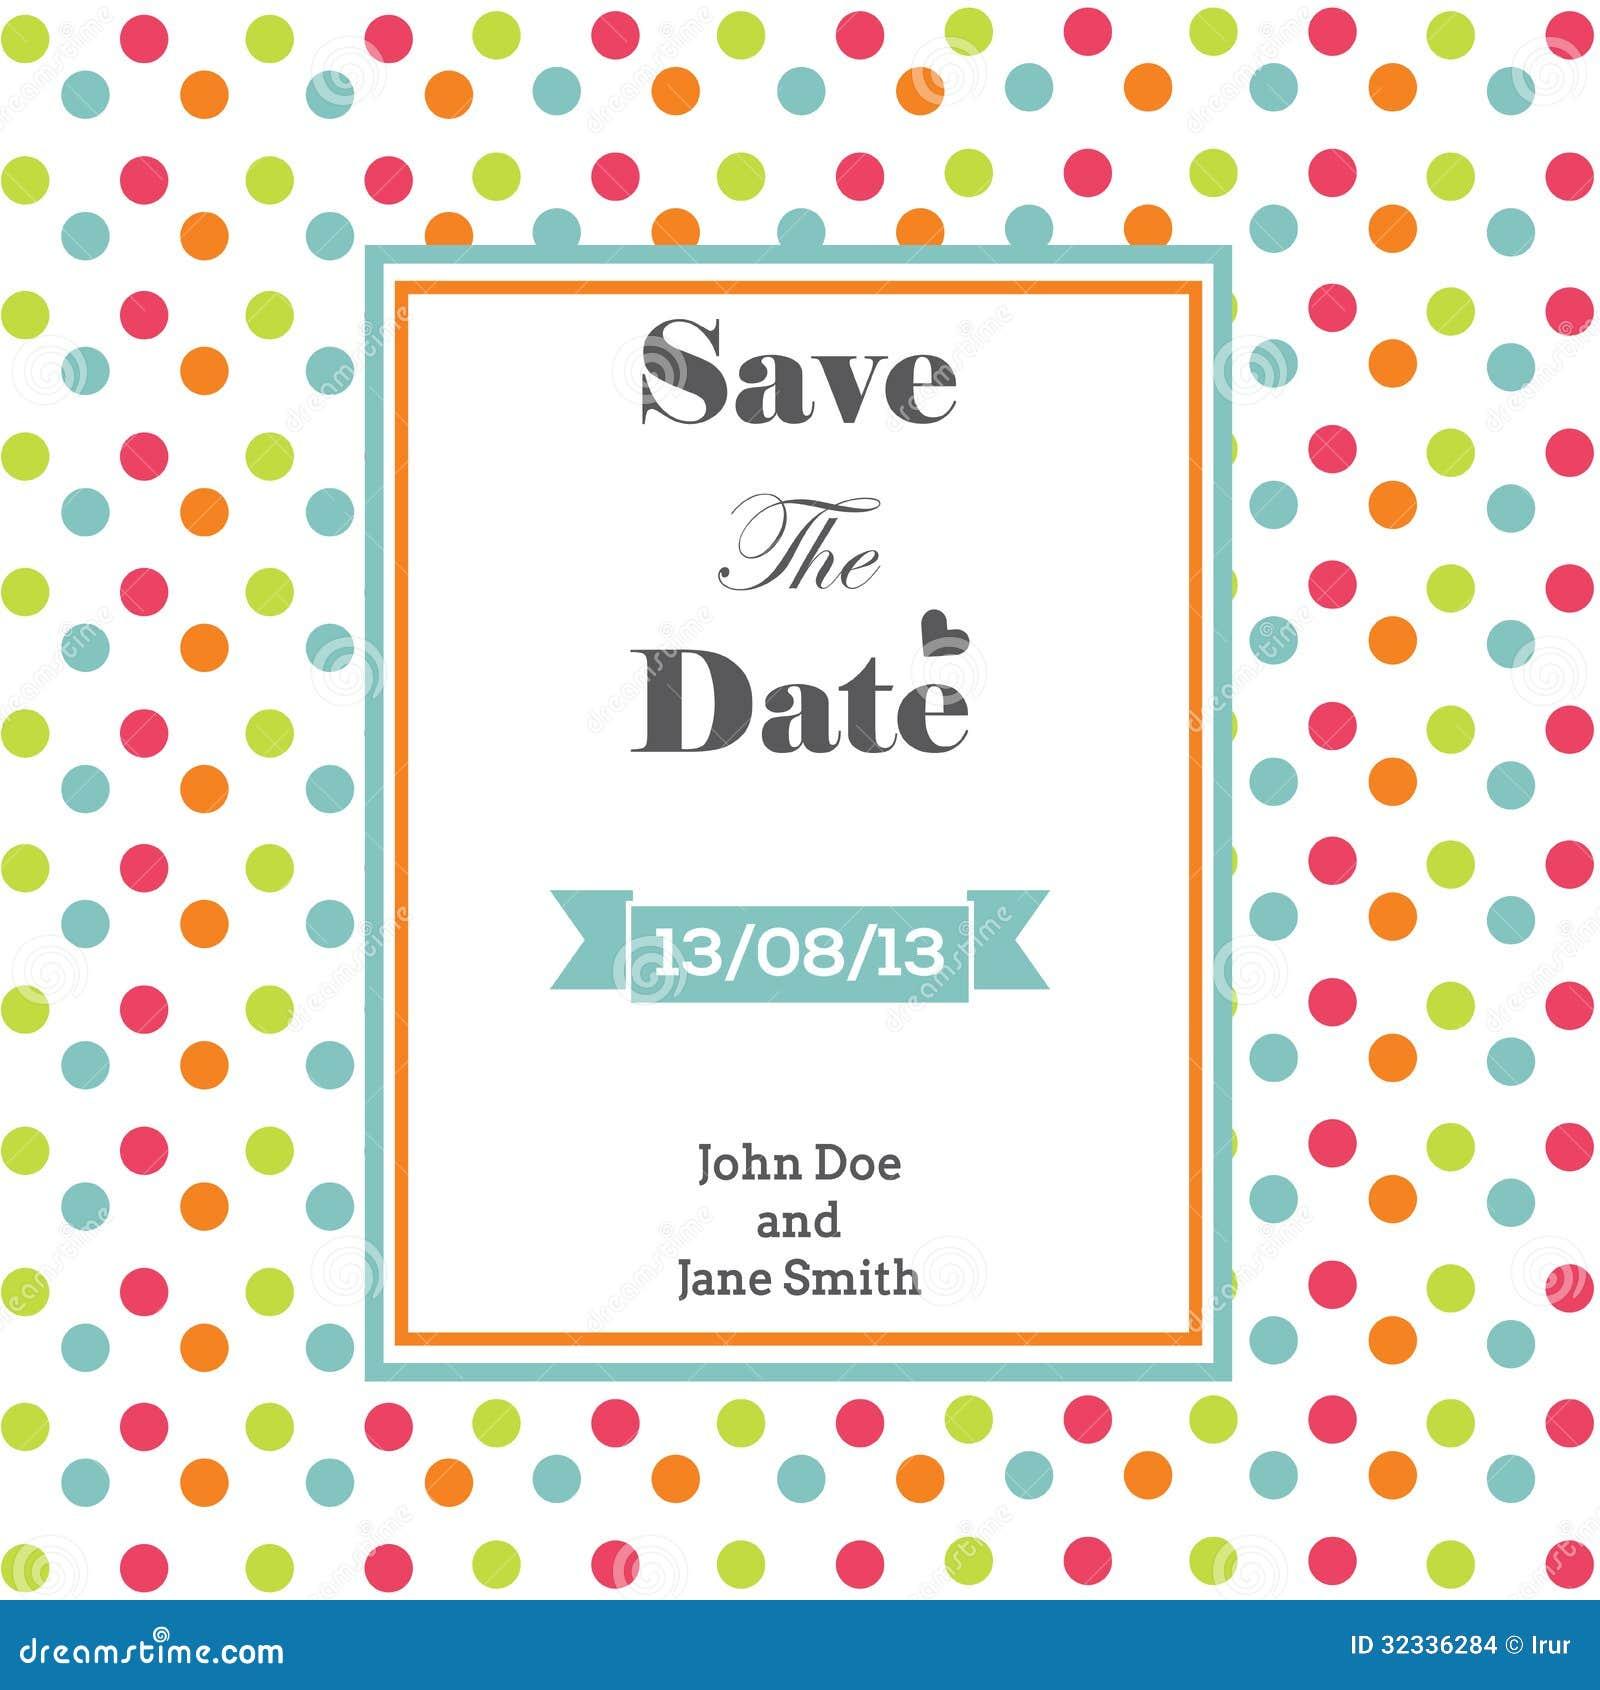 Wedding Invitations Walmart 86 Vintage Save the date wedding